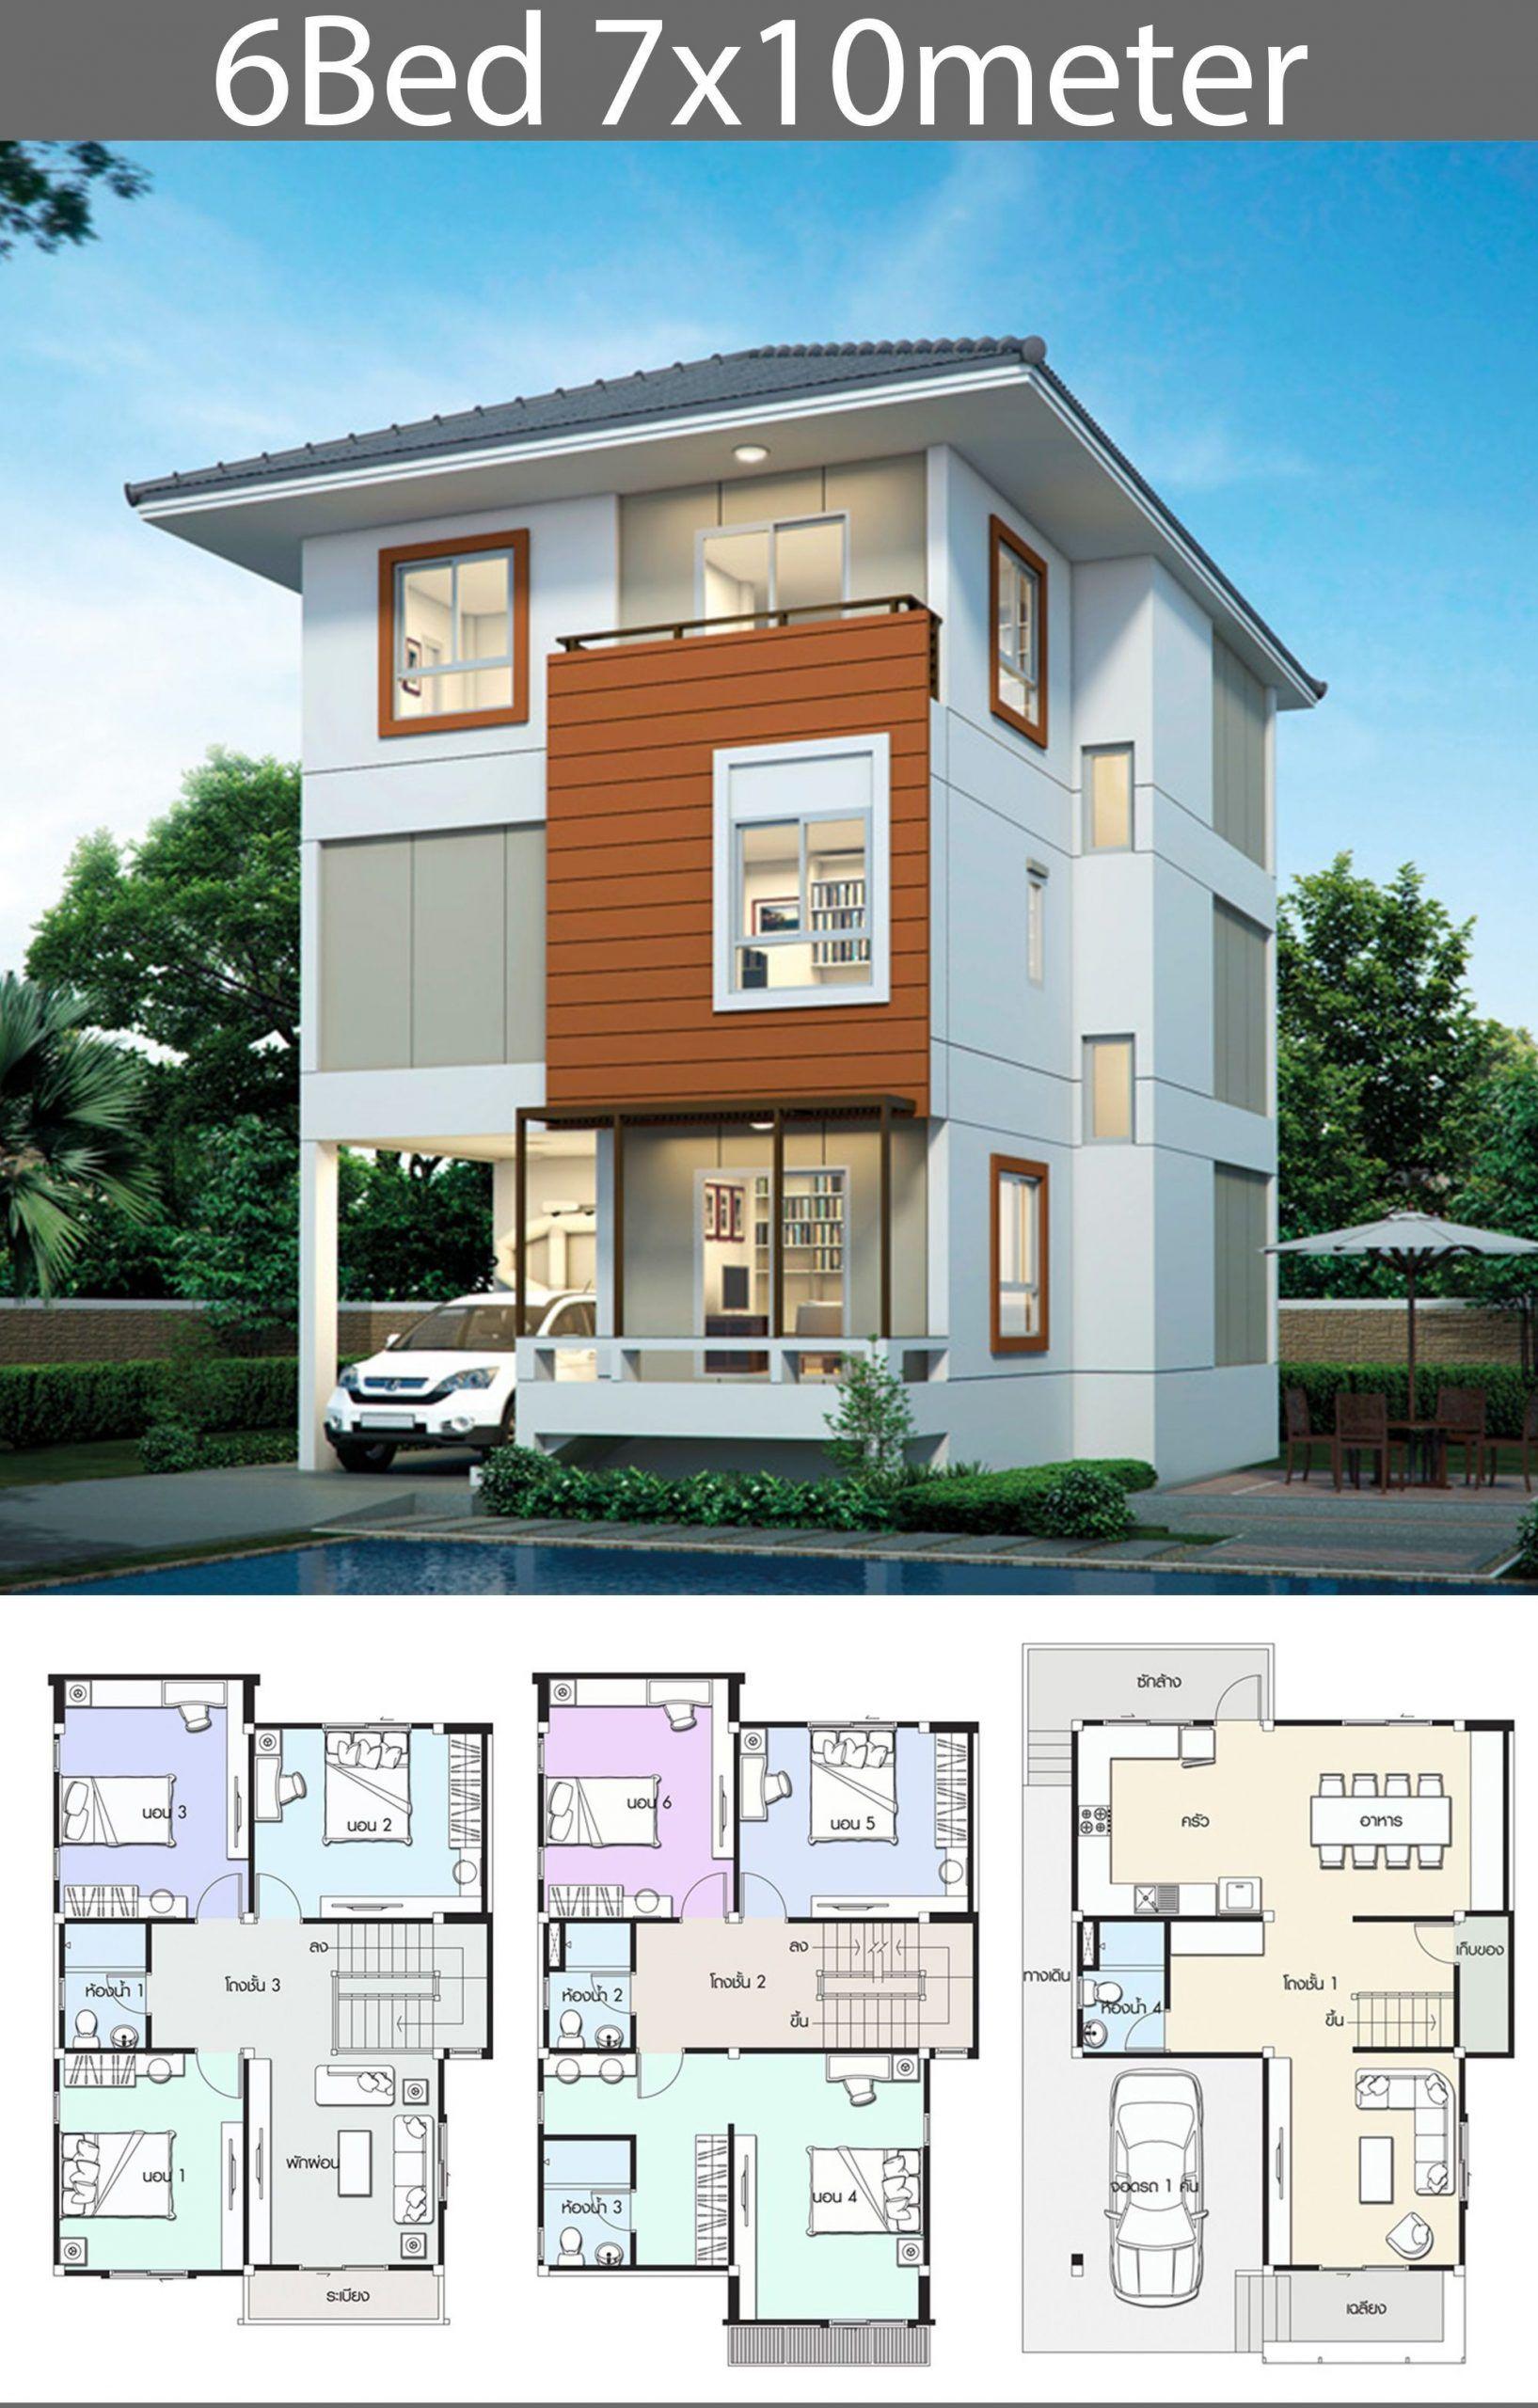 5 Ideas Home Design Plan 7x10m Modern House Plans Home Design Plans Home Design Plan